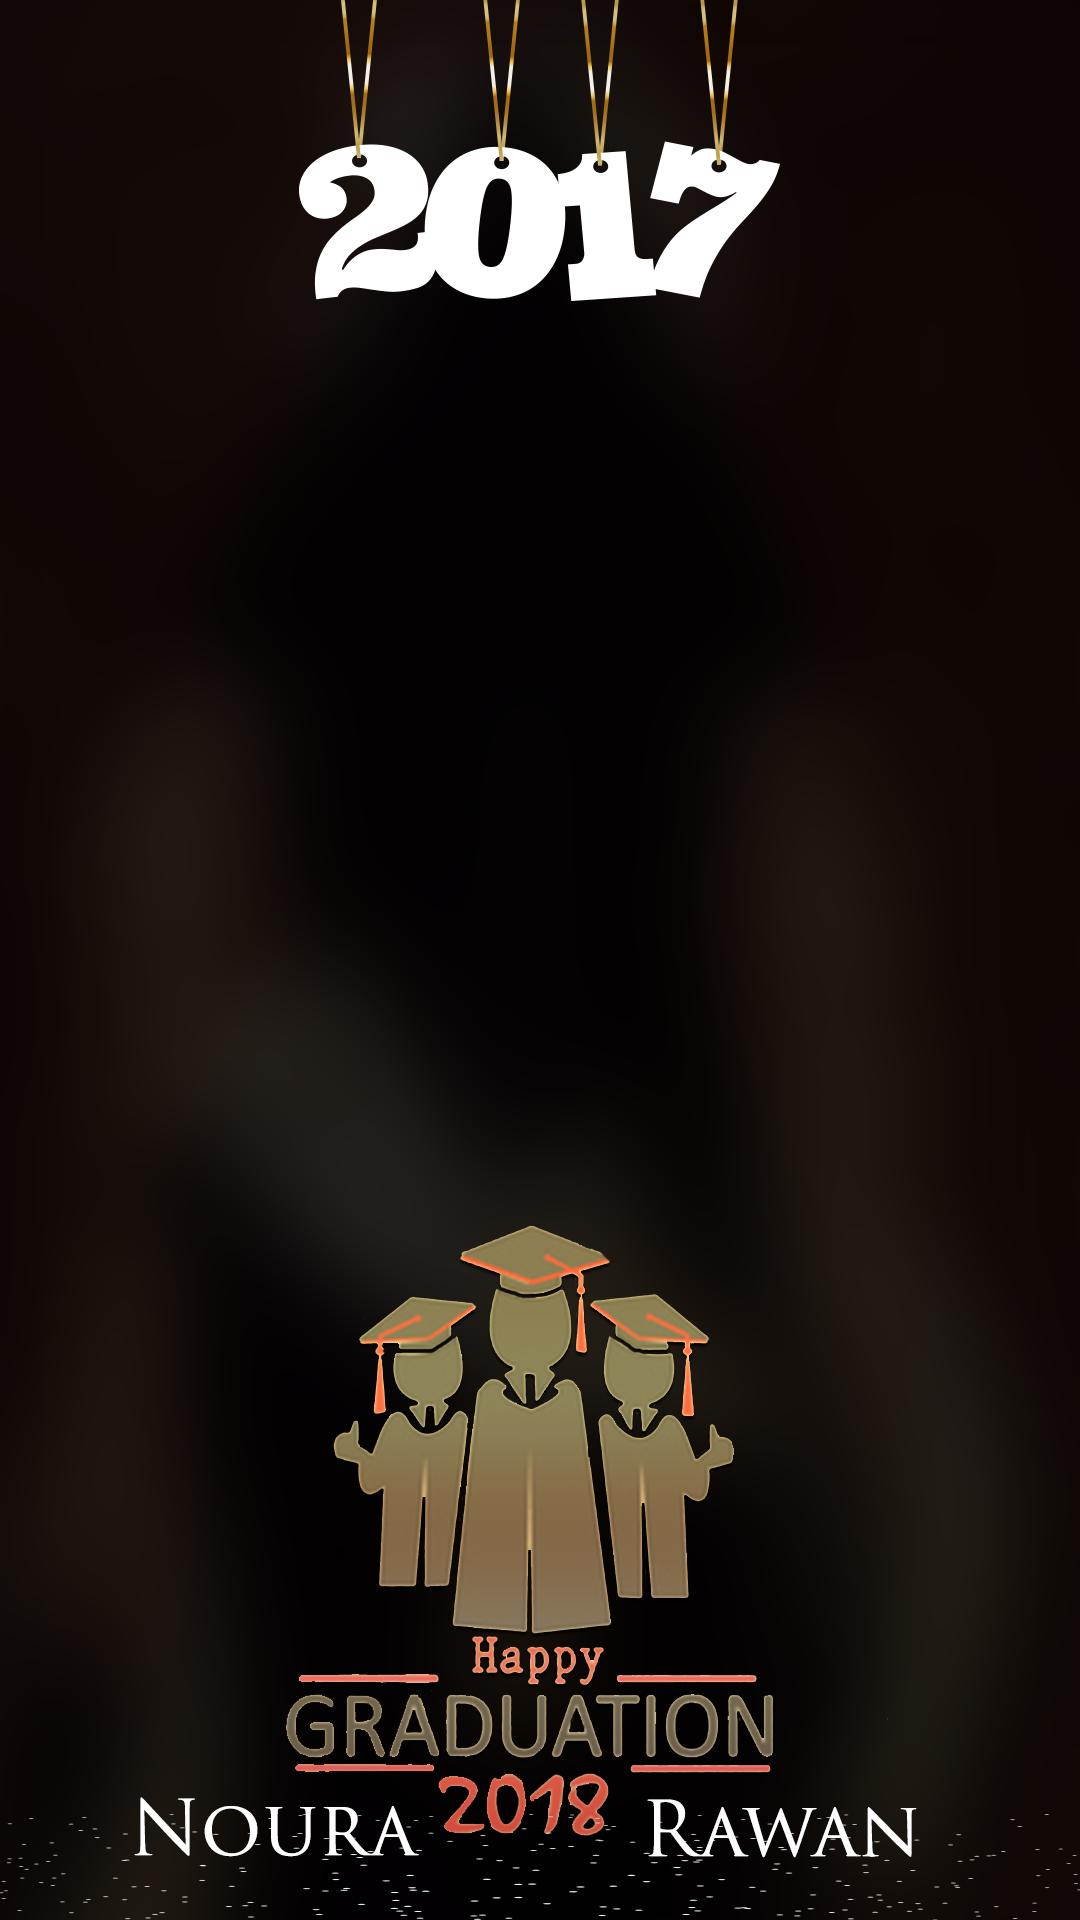 فلتر تخرج احترافي لعام 2018 لتصميم فلاتر سناب شات فلتر تخرج فلاتر فلتر خاص فلتر زواج فلتر مواليد فلاتر سناب شا Happy Graduation Graduation Movie Posters